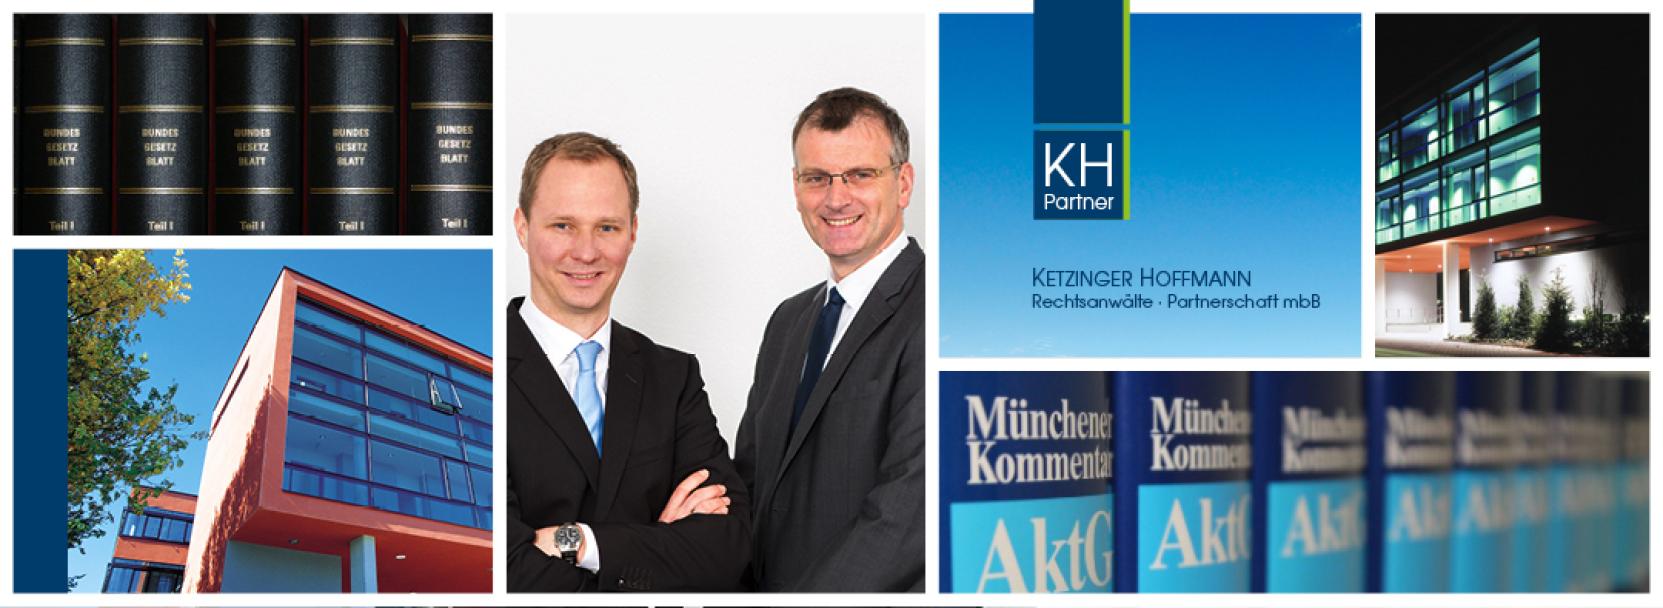 Rechtsanwälte Ketzinger Hoffmann PartG mbB